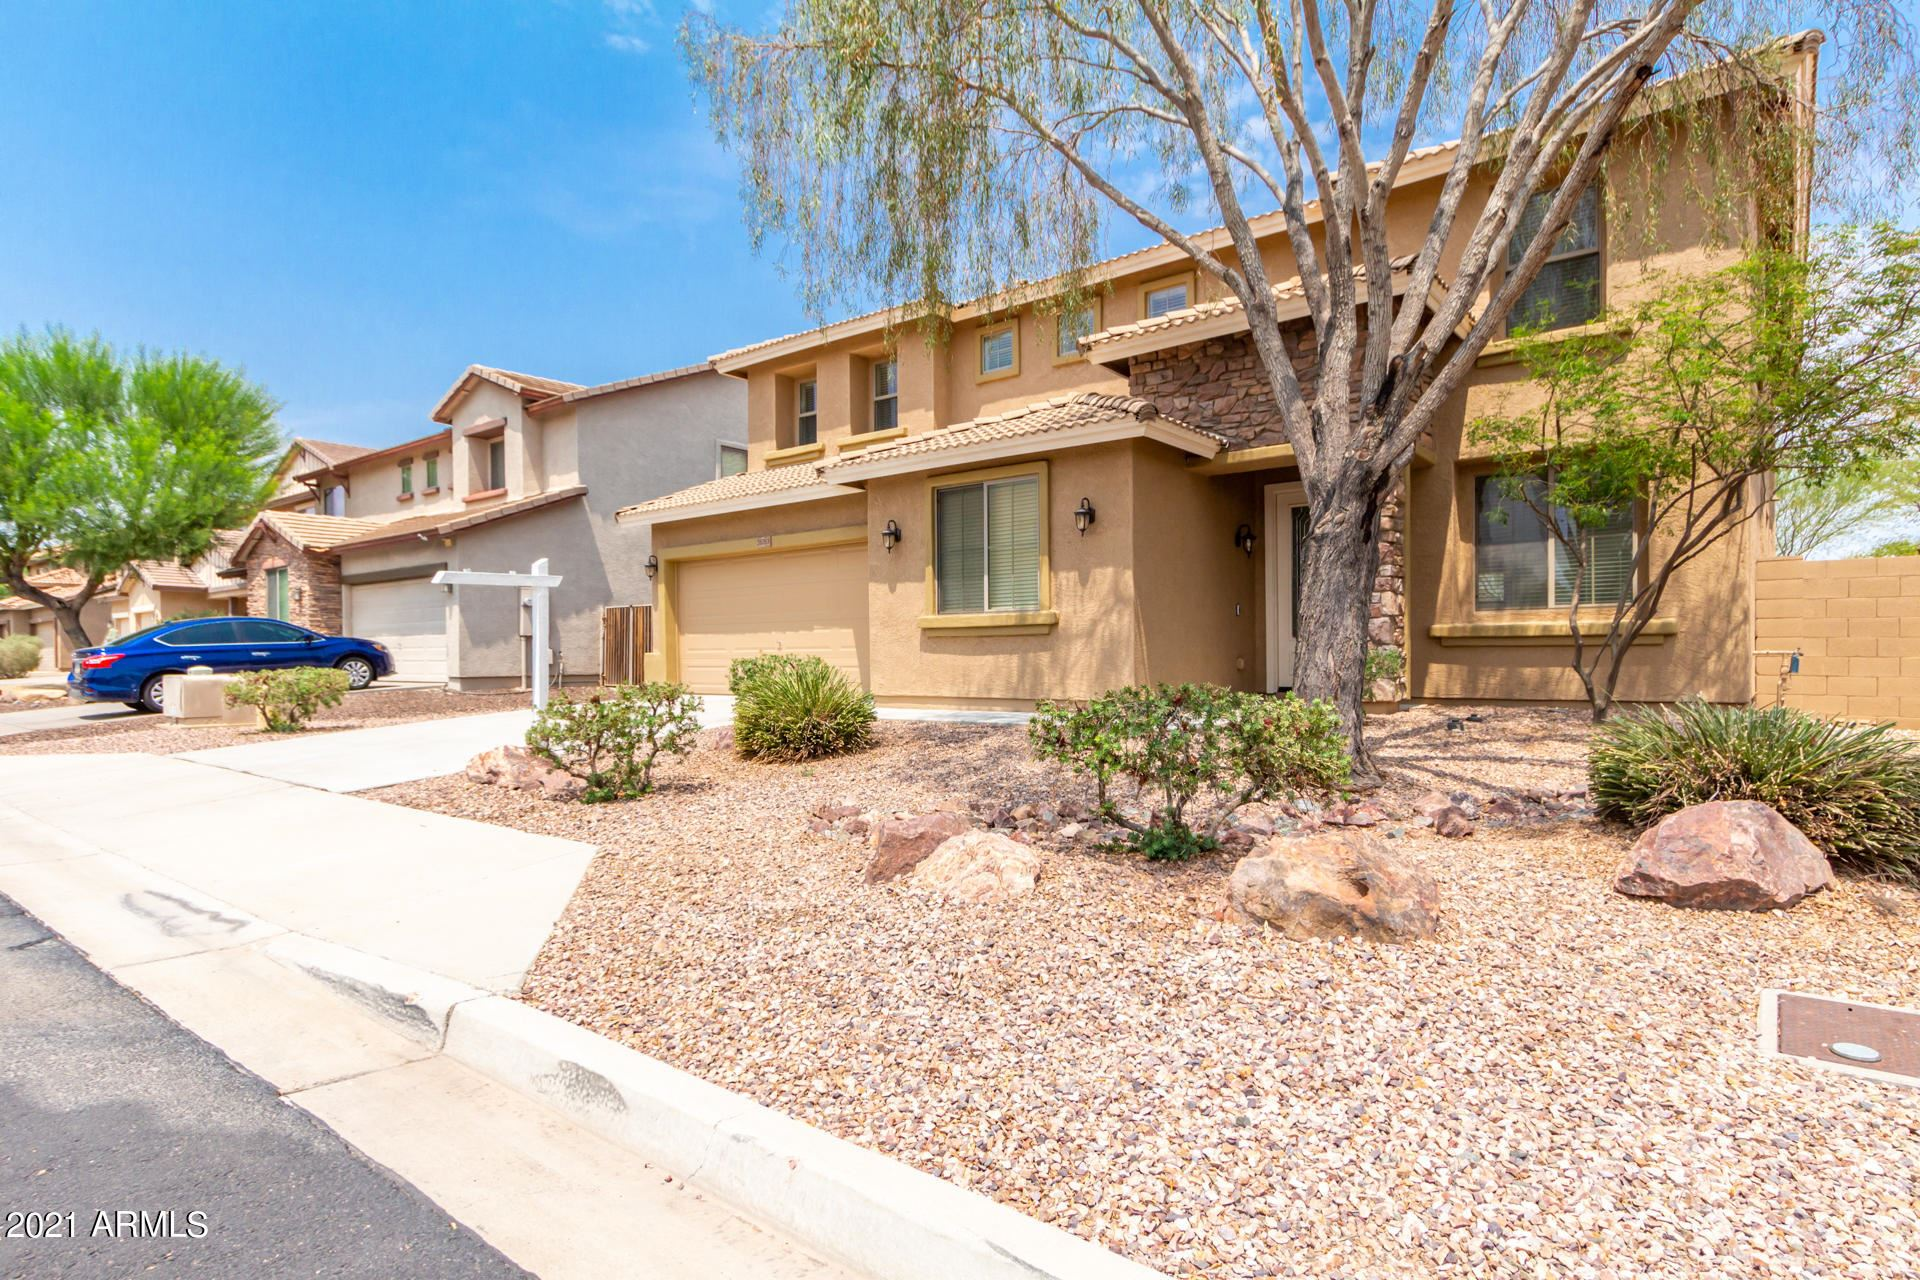 Photo of 26763 N 78Th Avenue, Peoria, AZ 85383 (MLS # 6268765)